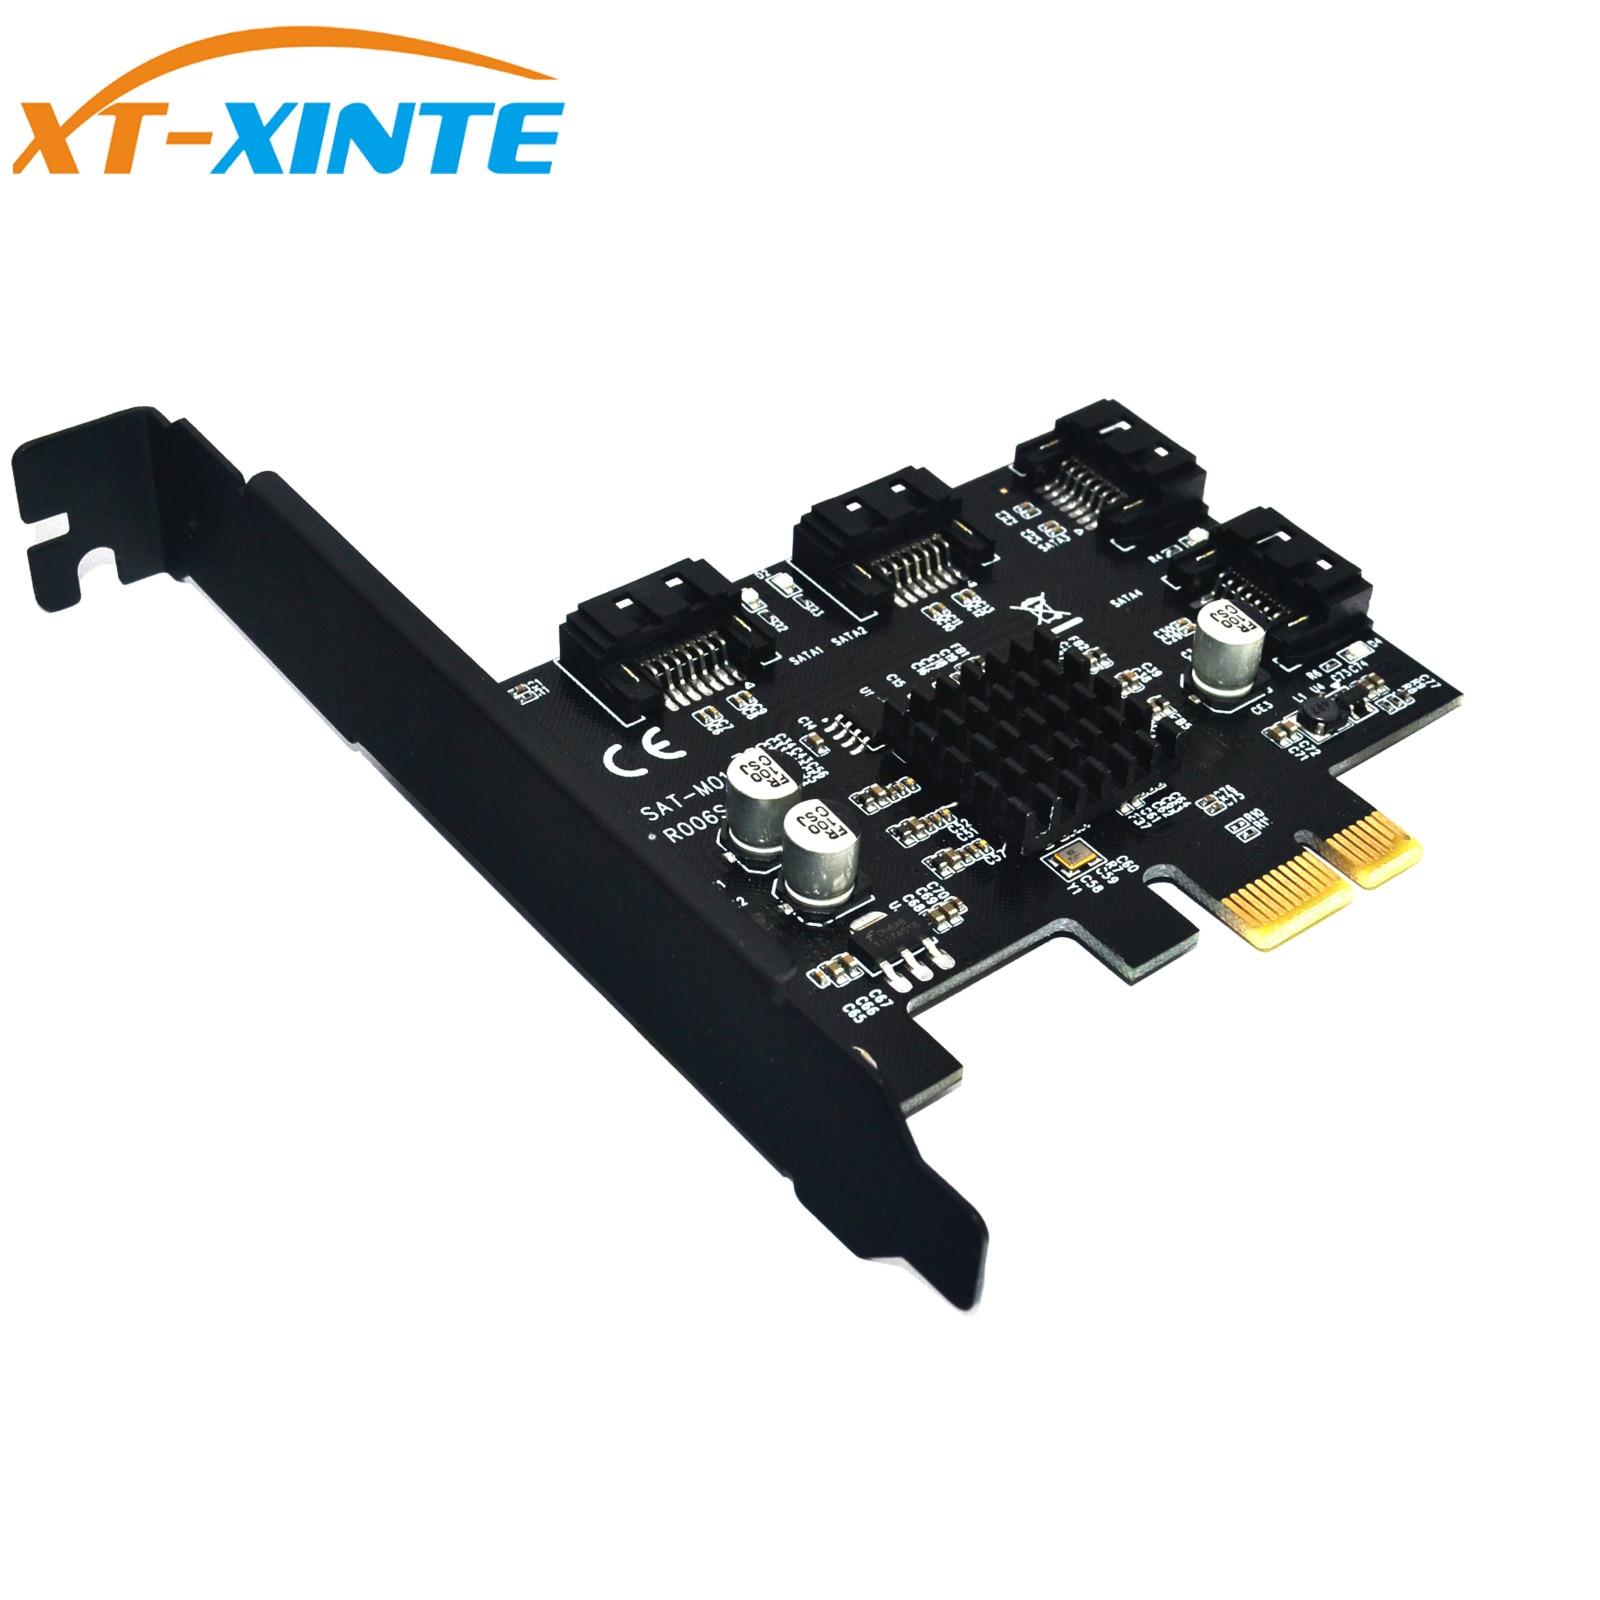 88SE9215 4 Ports SATA 6G PCI Express Controller Card PCI-e To SATA III 3.0 Converter Support Low Profile Bracket SATA3.0 9230 sata3 0 6g array card support